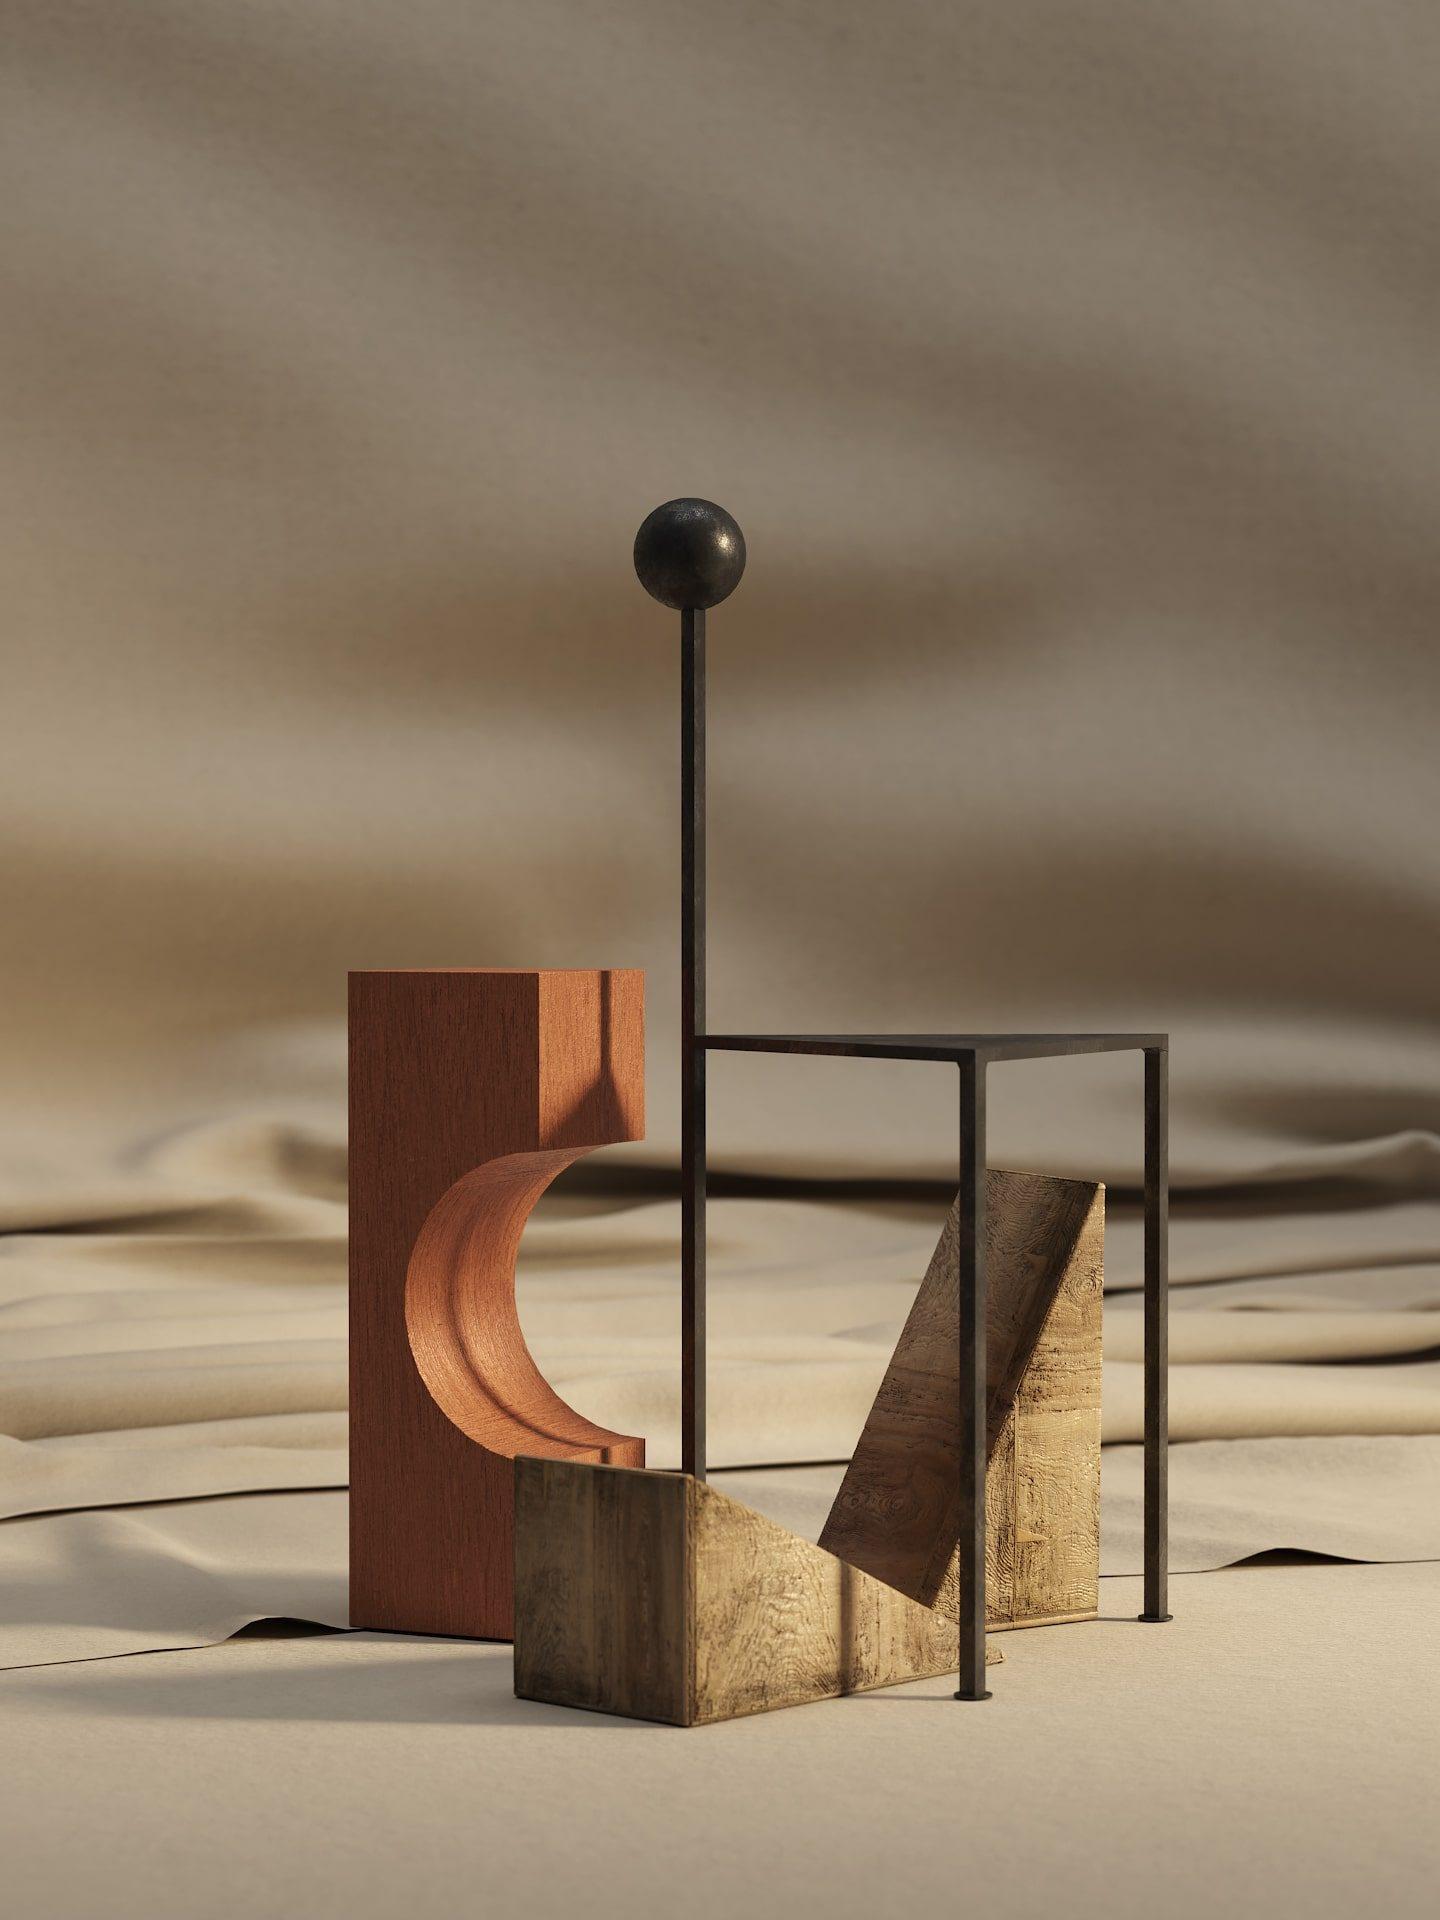 IGNANT-Art-Digital-FormUndRausch-8